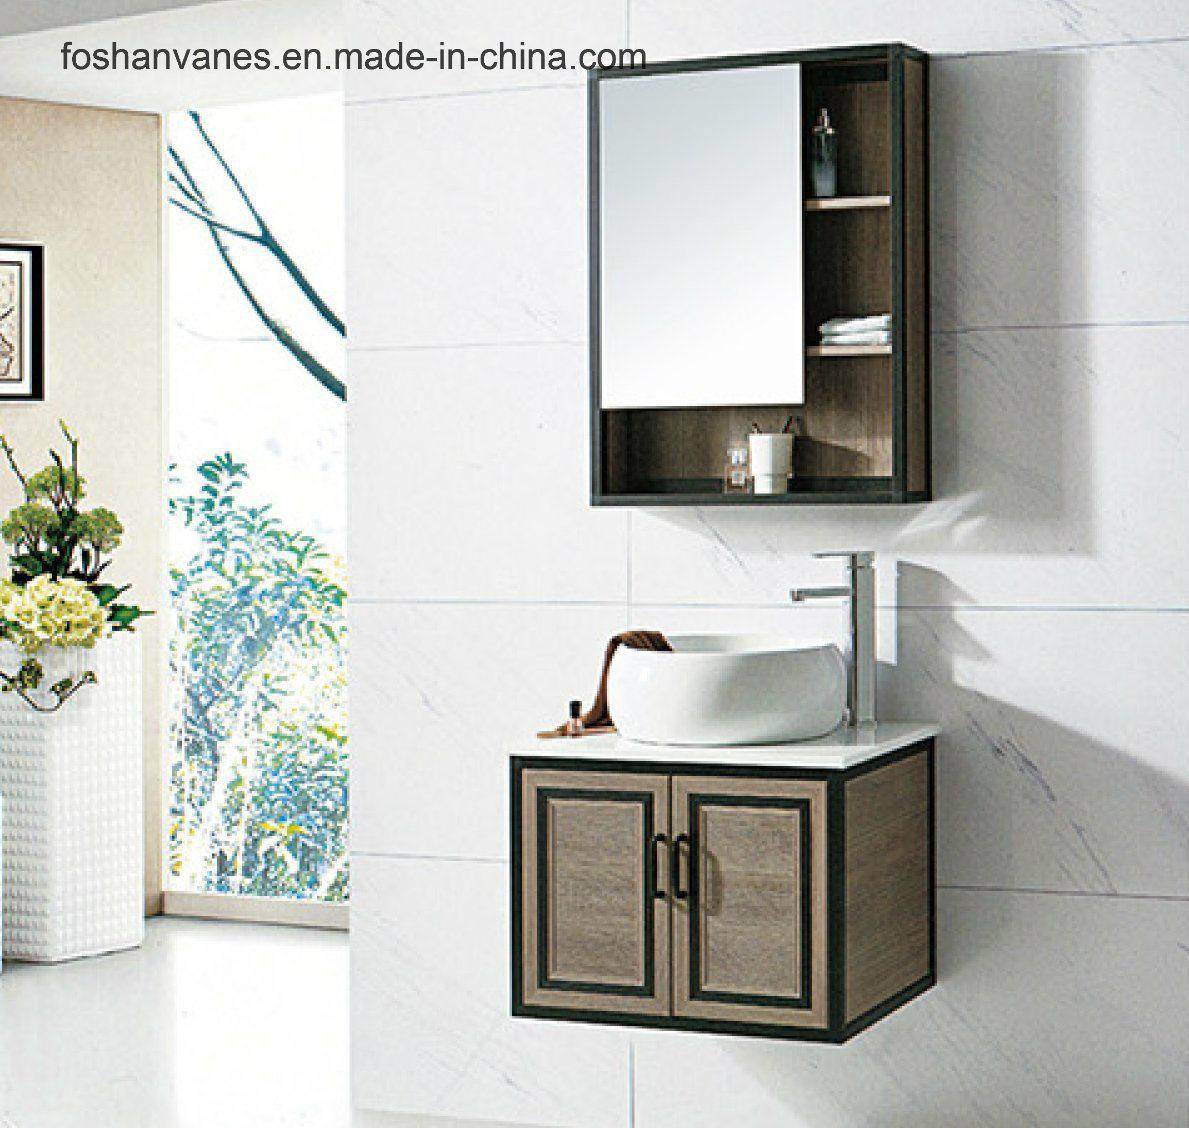 China Wall Hung Space Saving Aluminum Bathroom Vanity Bathroom Sink With Faucet Al 2129 China Bathroom Cabinet Bathroom Vanity